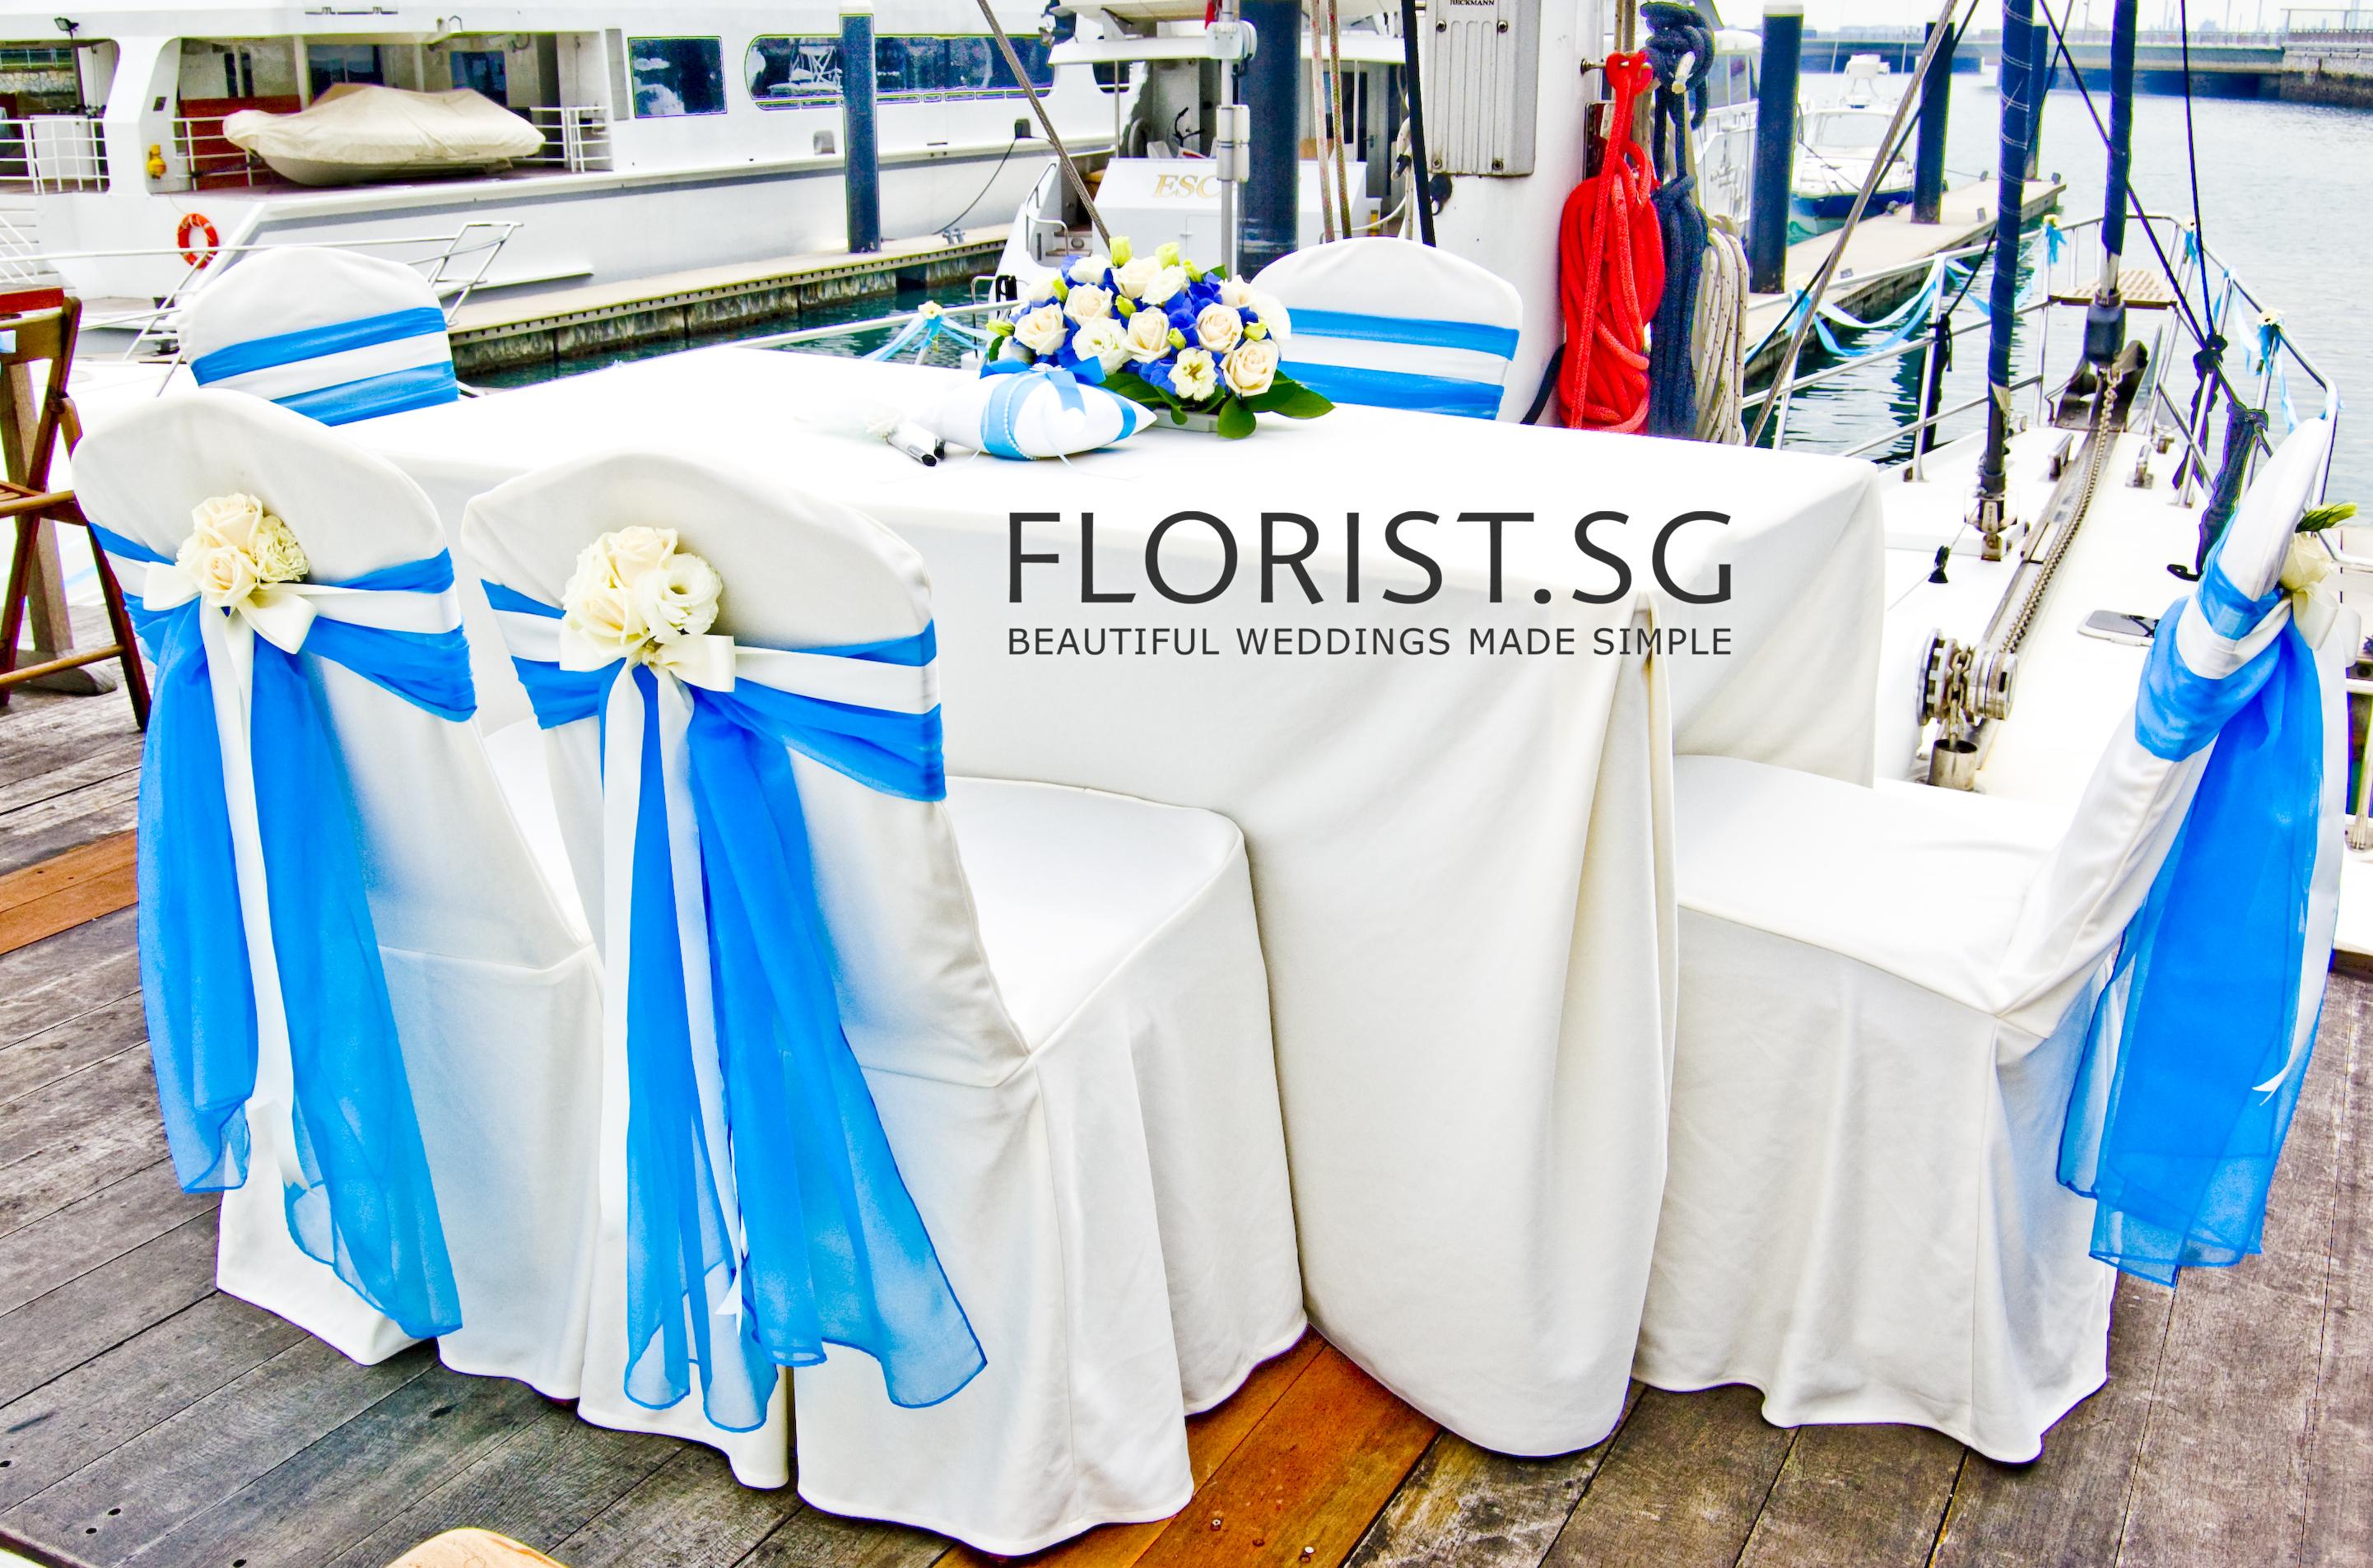 Florist Beautiful Weddings Made Simple Page 2